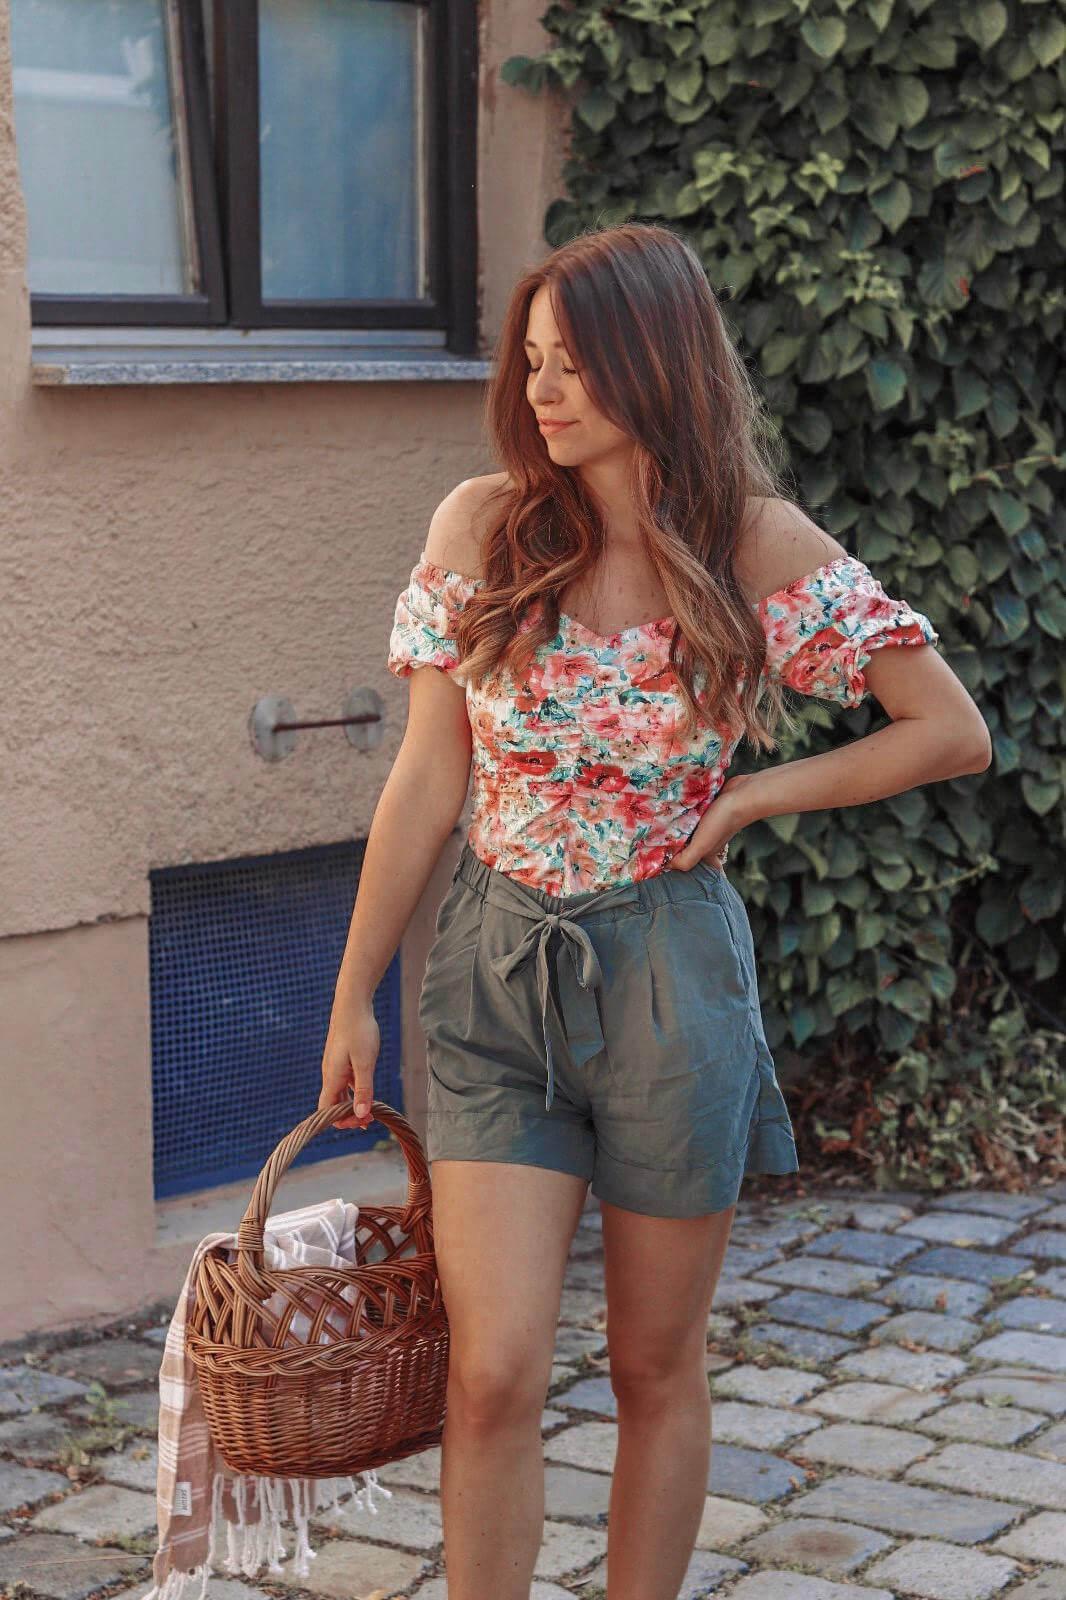 Sommer-Outfit-–-Styling-Tipps-für-den-perfekten-Sommer-Style